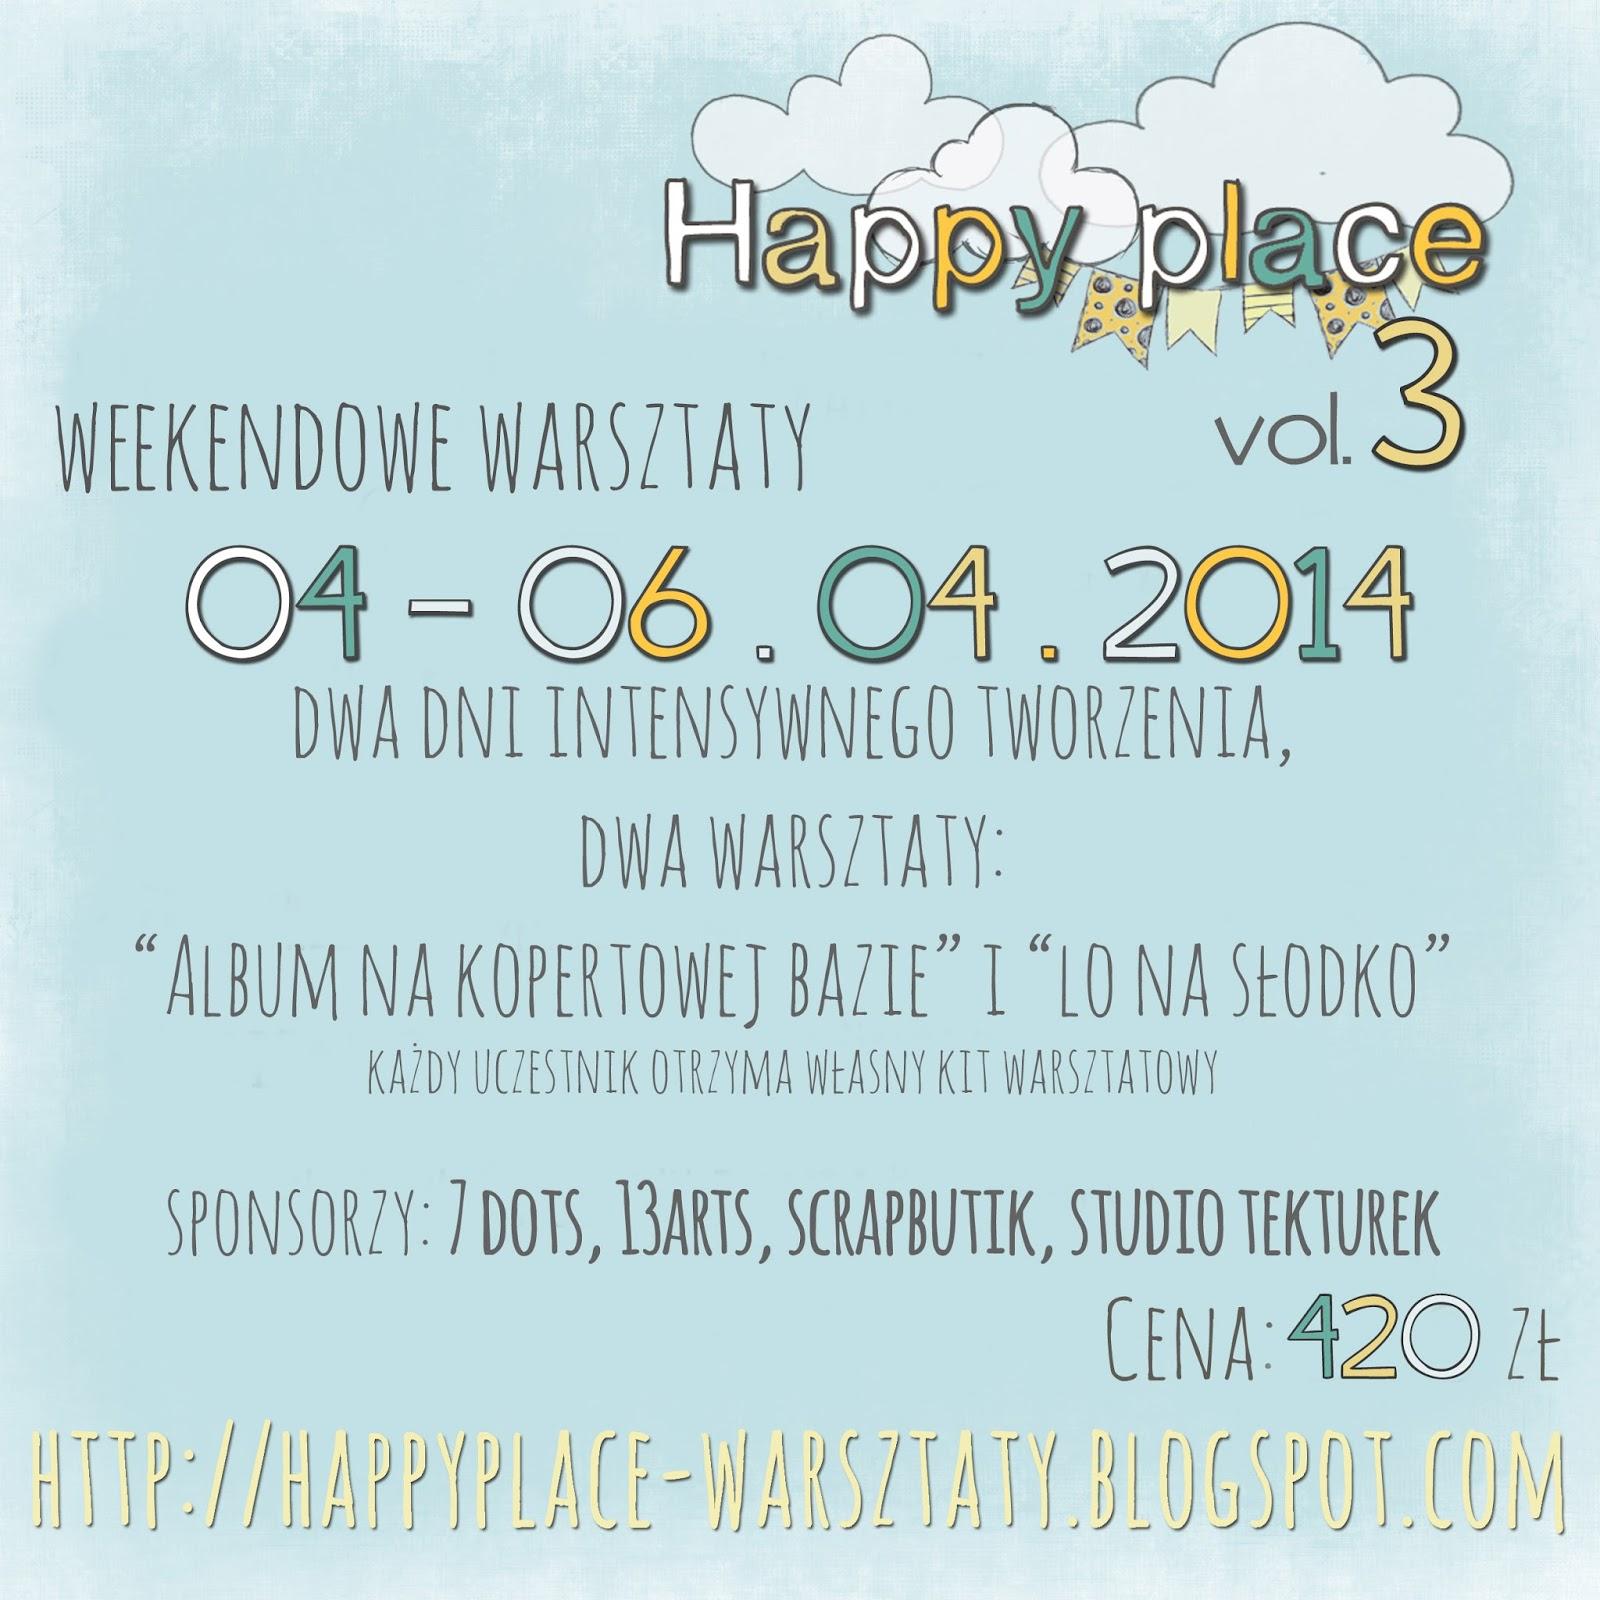 http://happyplace-warsztaty.blogspot.com/2014/02/happy-place-vol-3.html